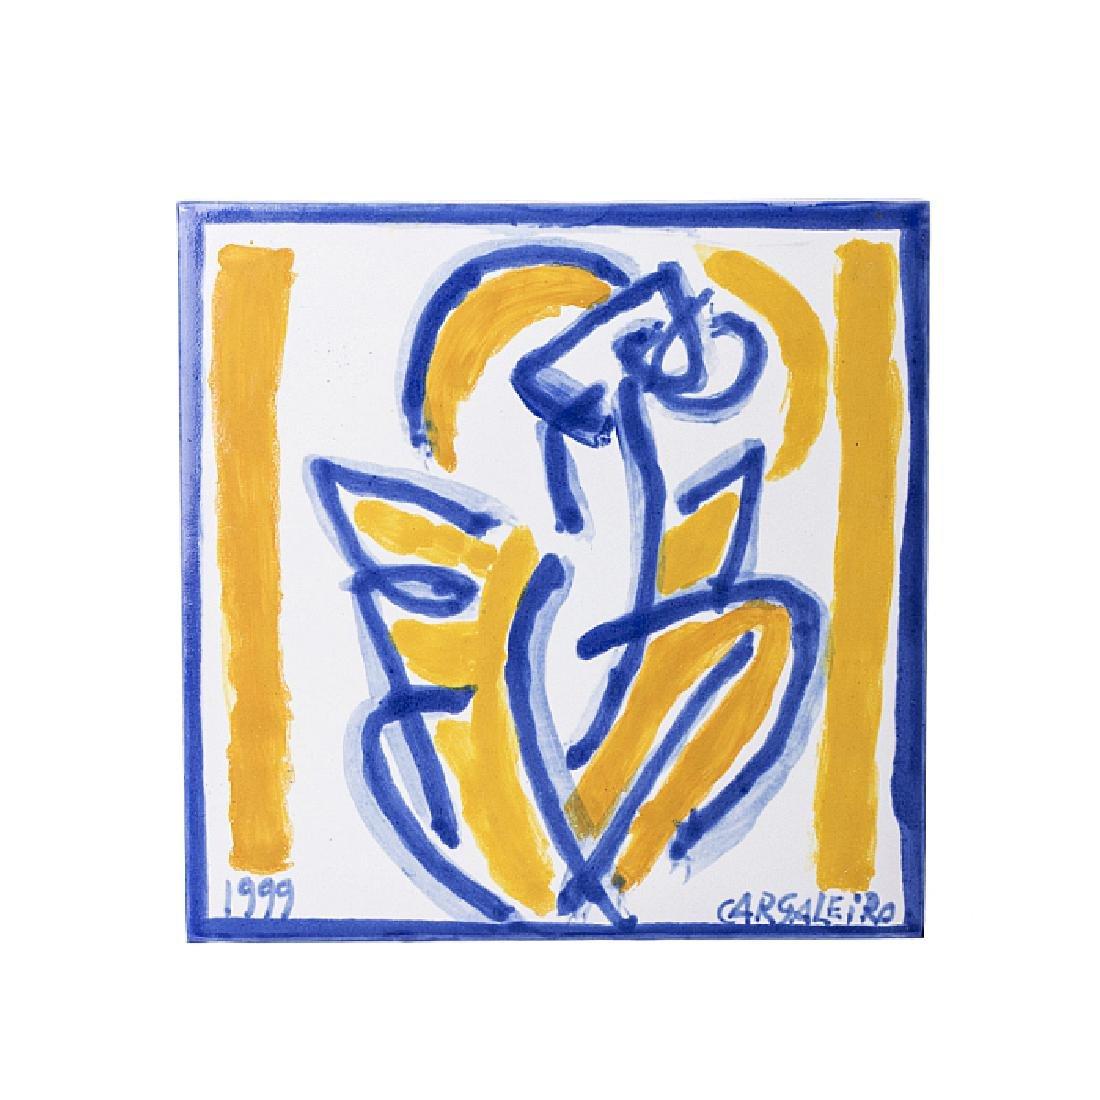 MANUEL CARGALEIRO (b. 1927) -  Tile